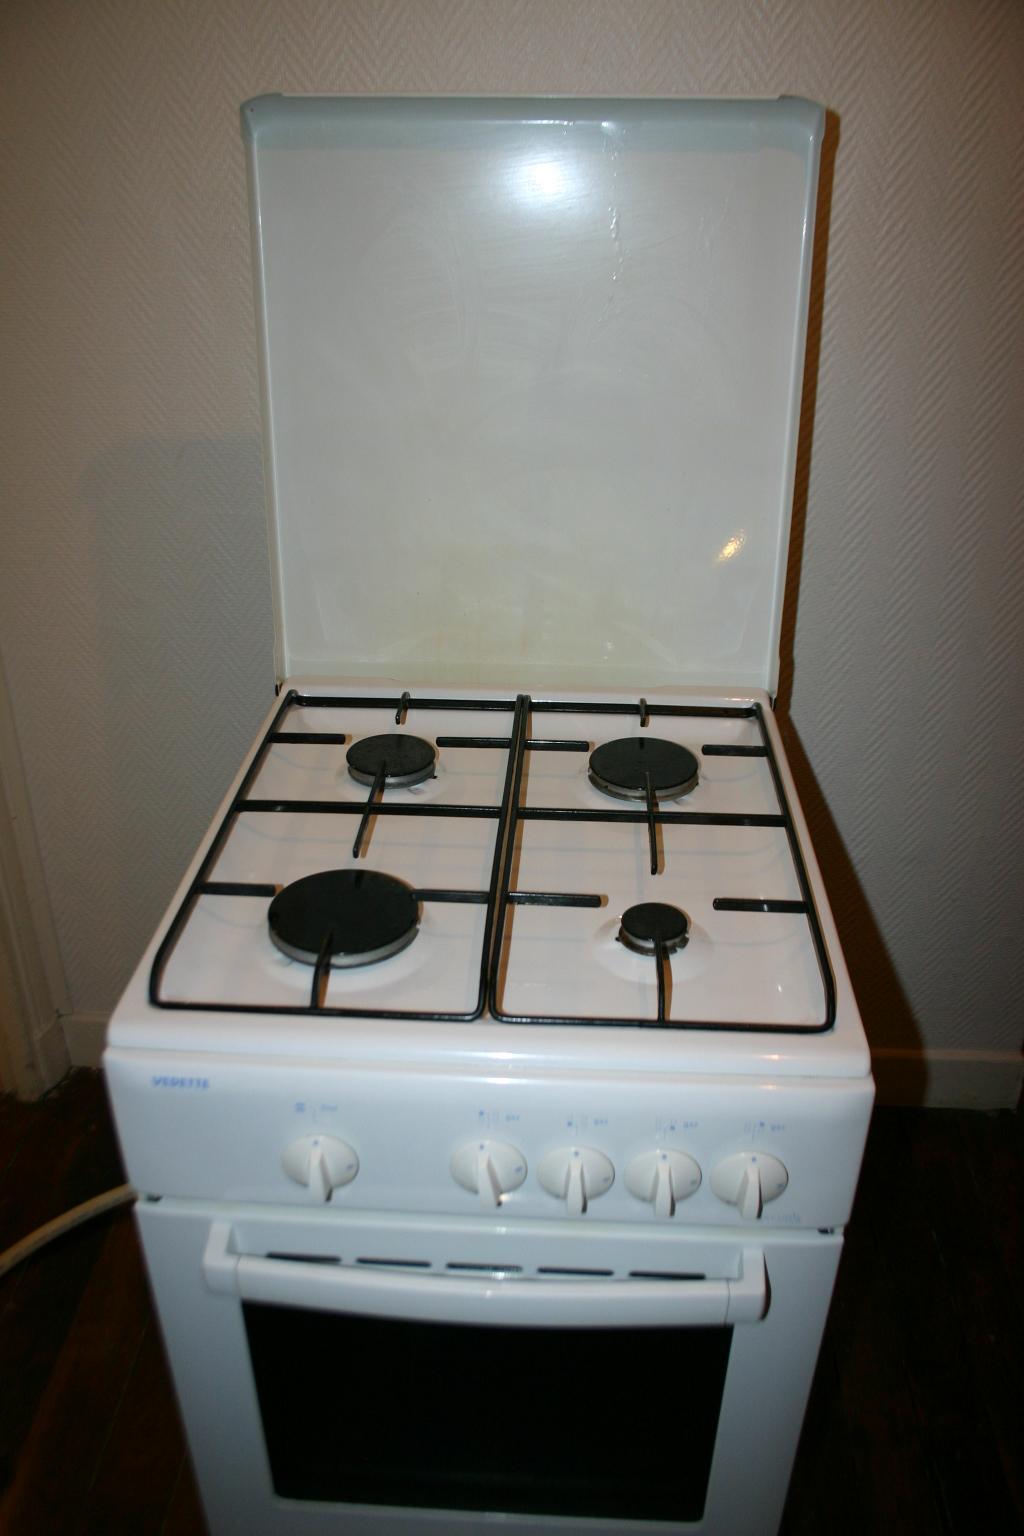 cuisiniere tout gaz max min. Black Bedroom Furniture Sets. Home Design Ideas